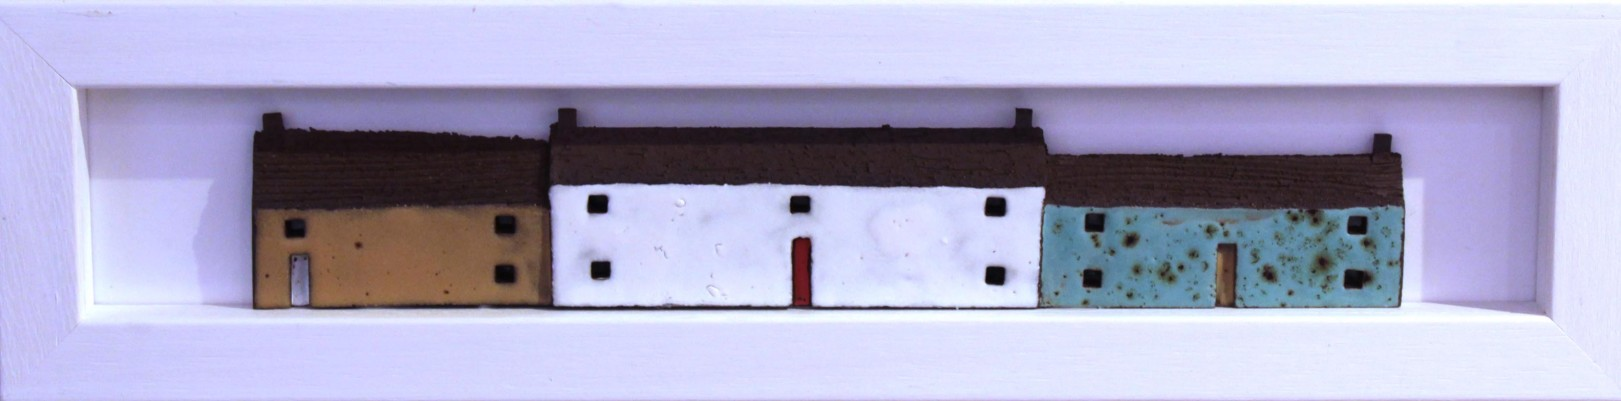 Pauline Montgomery_Original_Ceramics_Wee Houses Framed_4x16_200 (2)